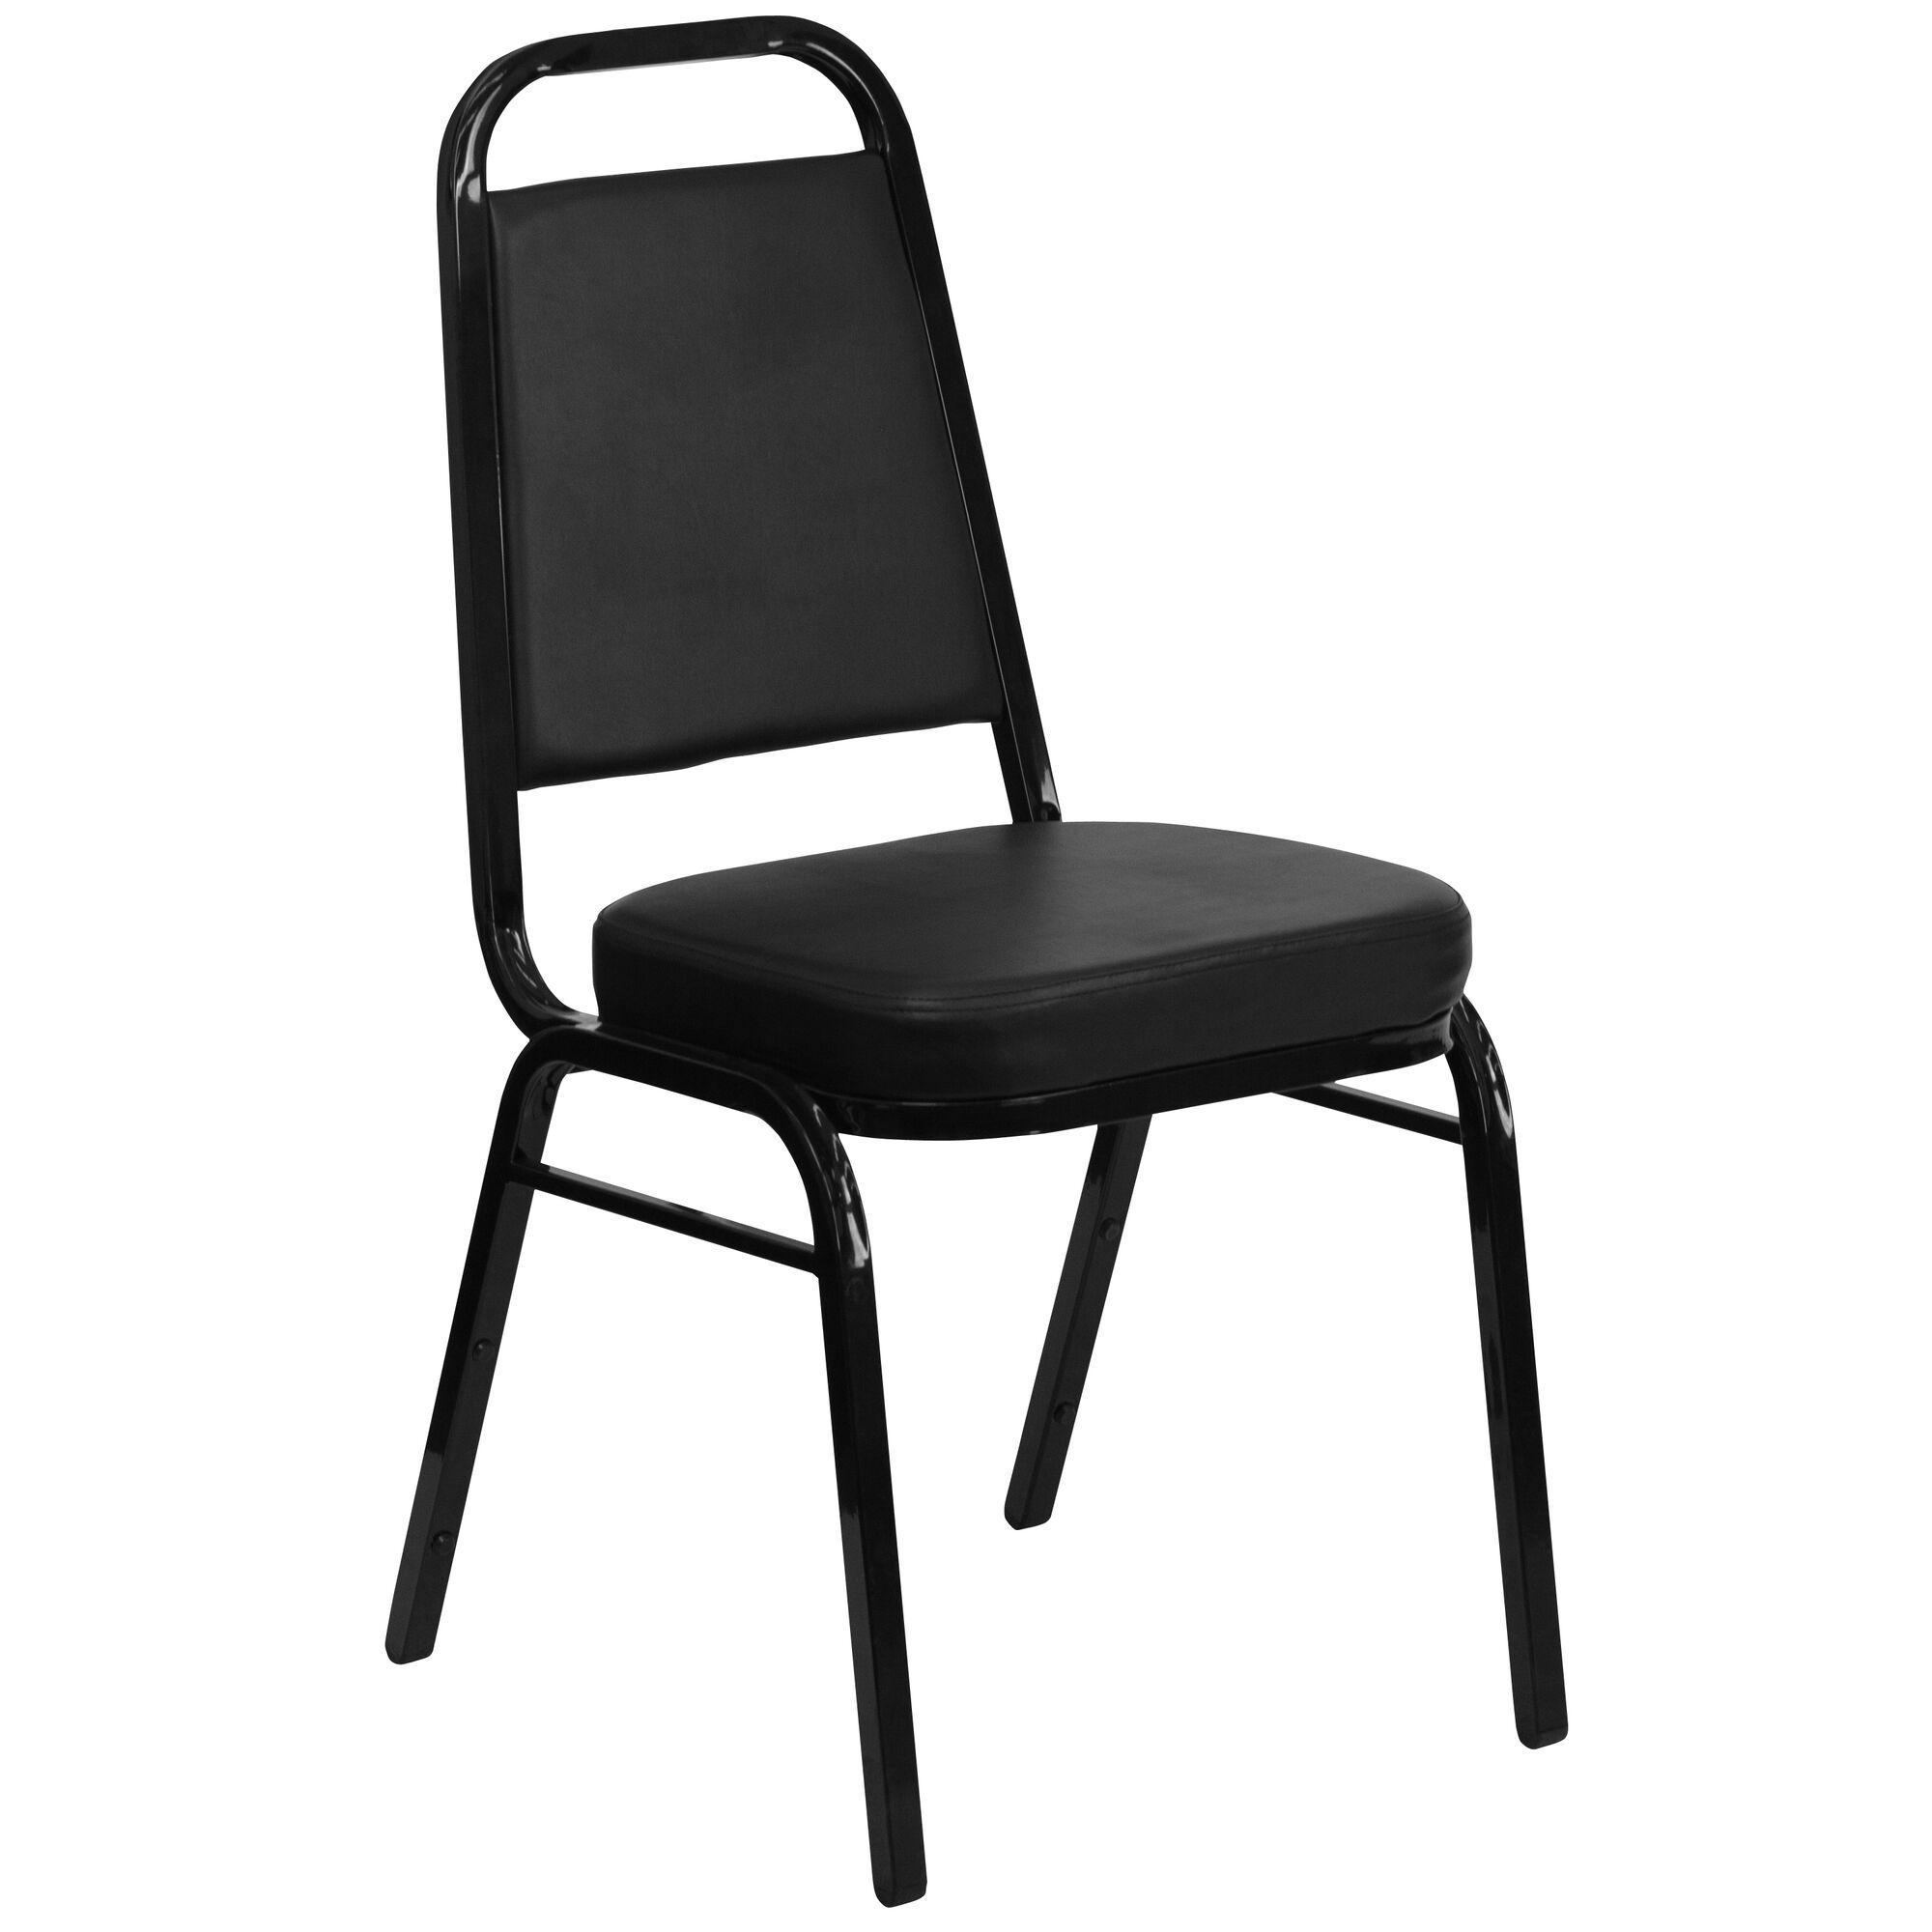 Flash Furniture HERCULES Series Trapezoidal Back Stacking Banquet